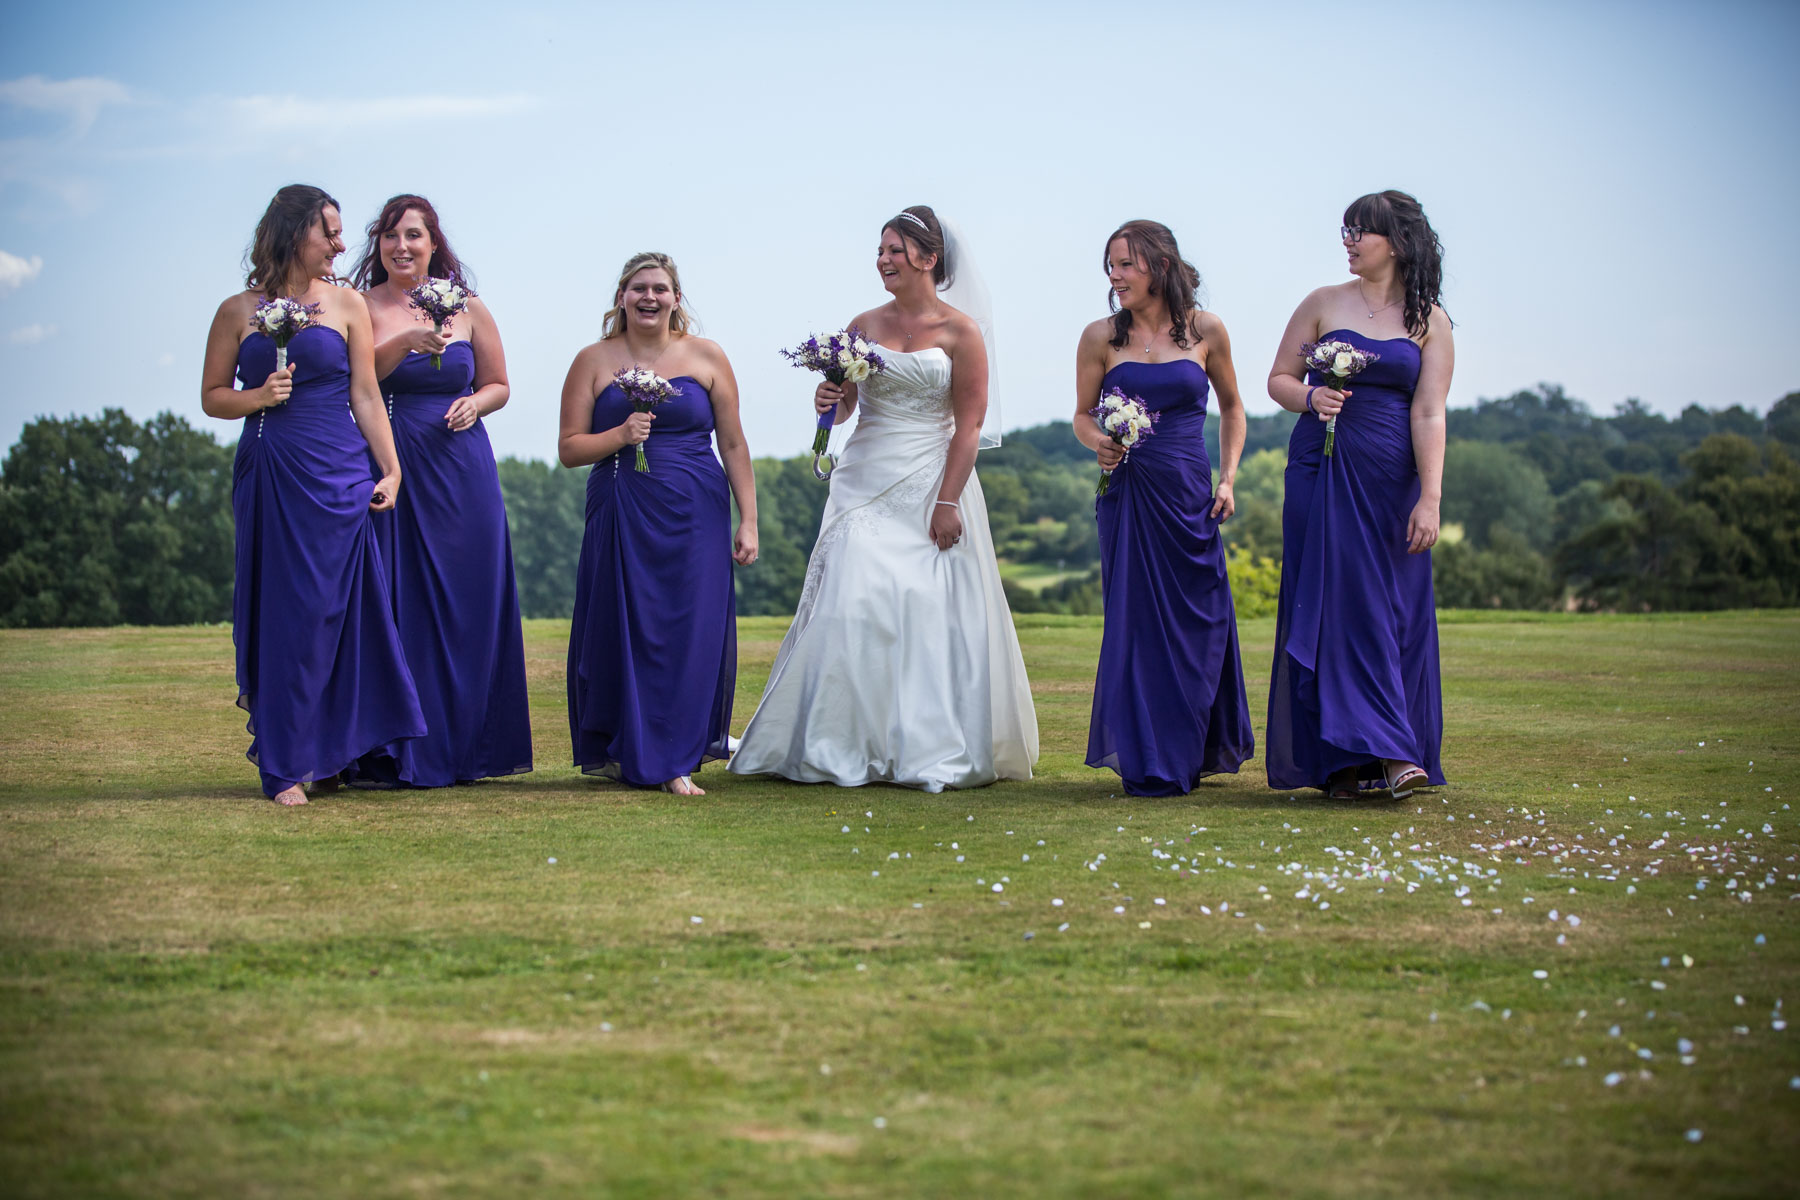 Sussex wedding photographer Richard Murgatroyd Murgatroyd Buxted Park Hotel